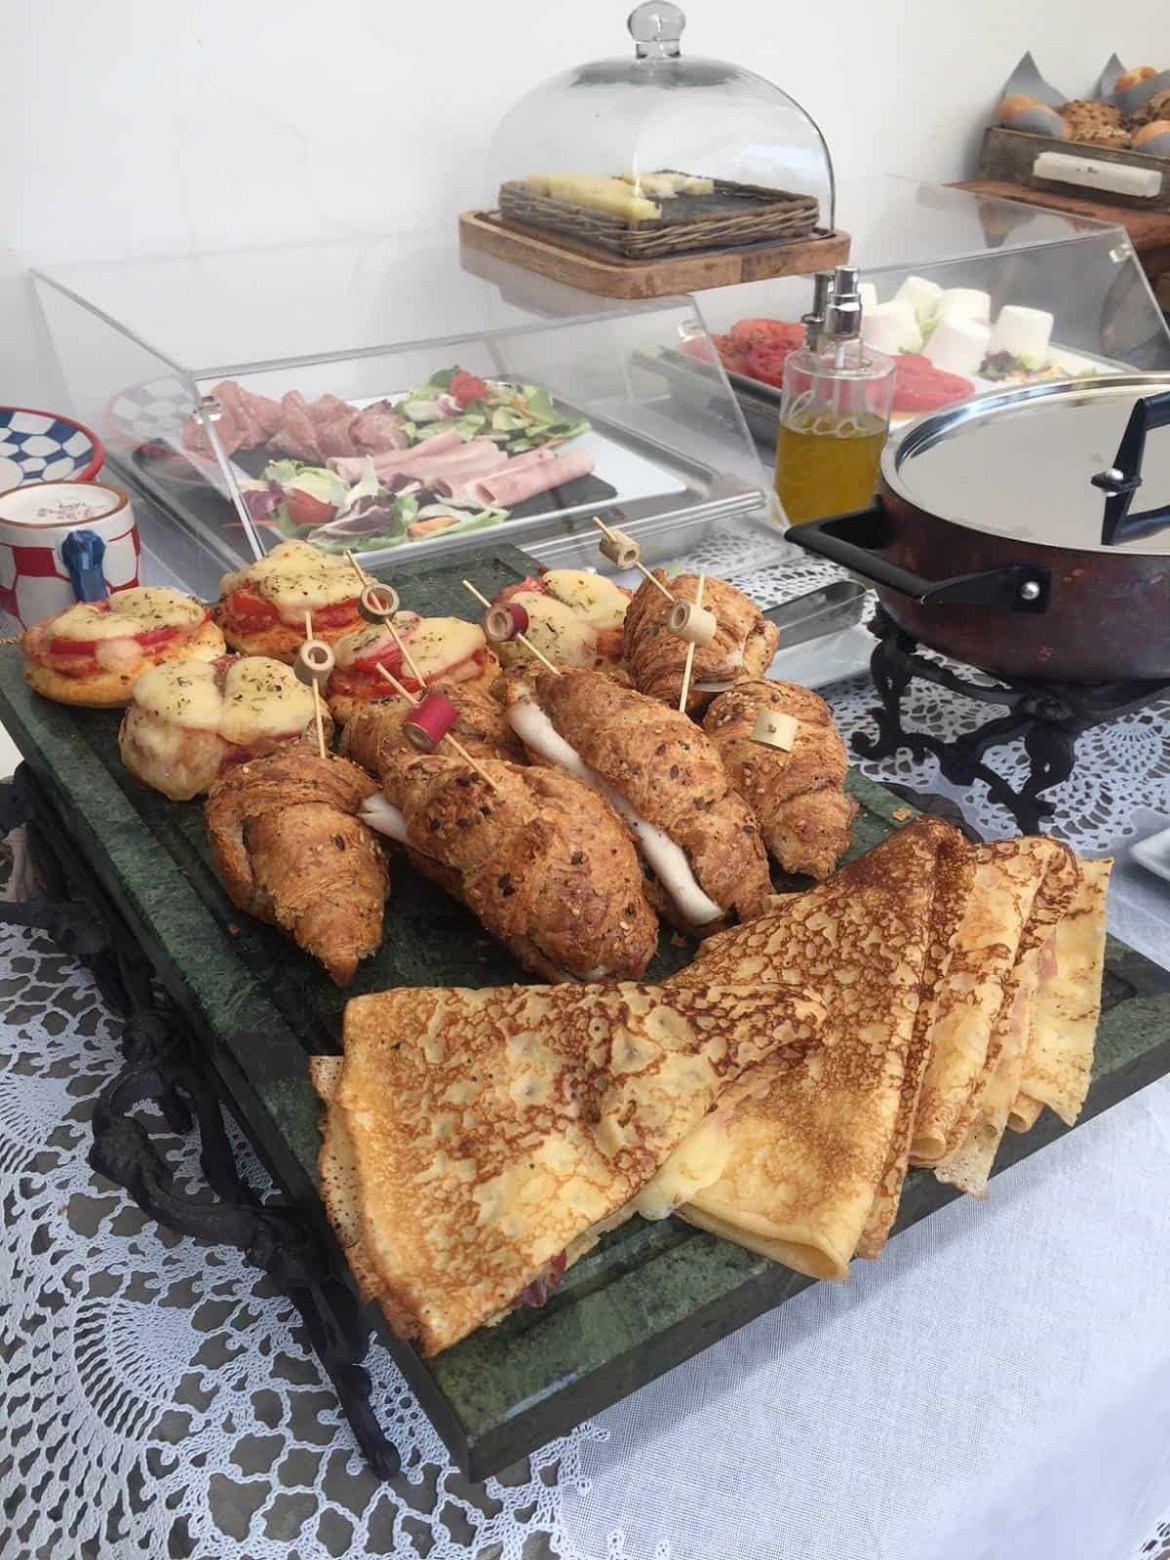 Savoury selection at Casa Buonocore